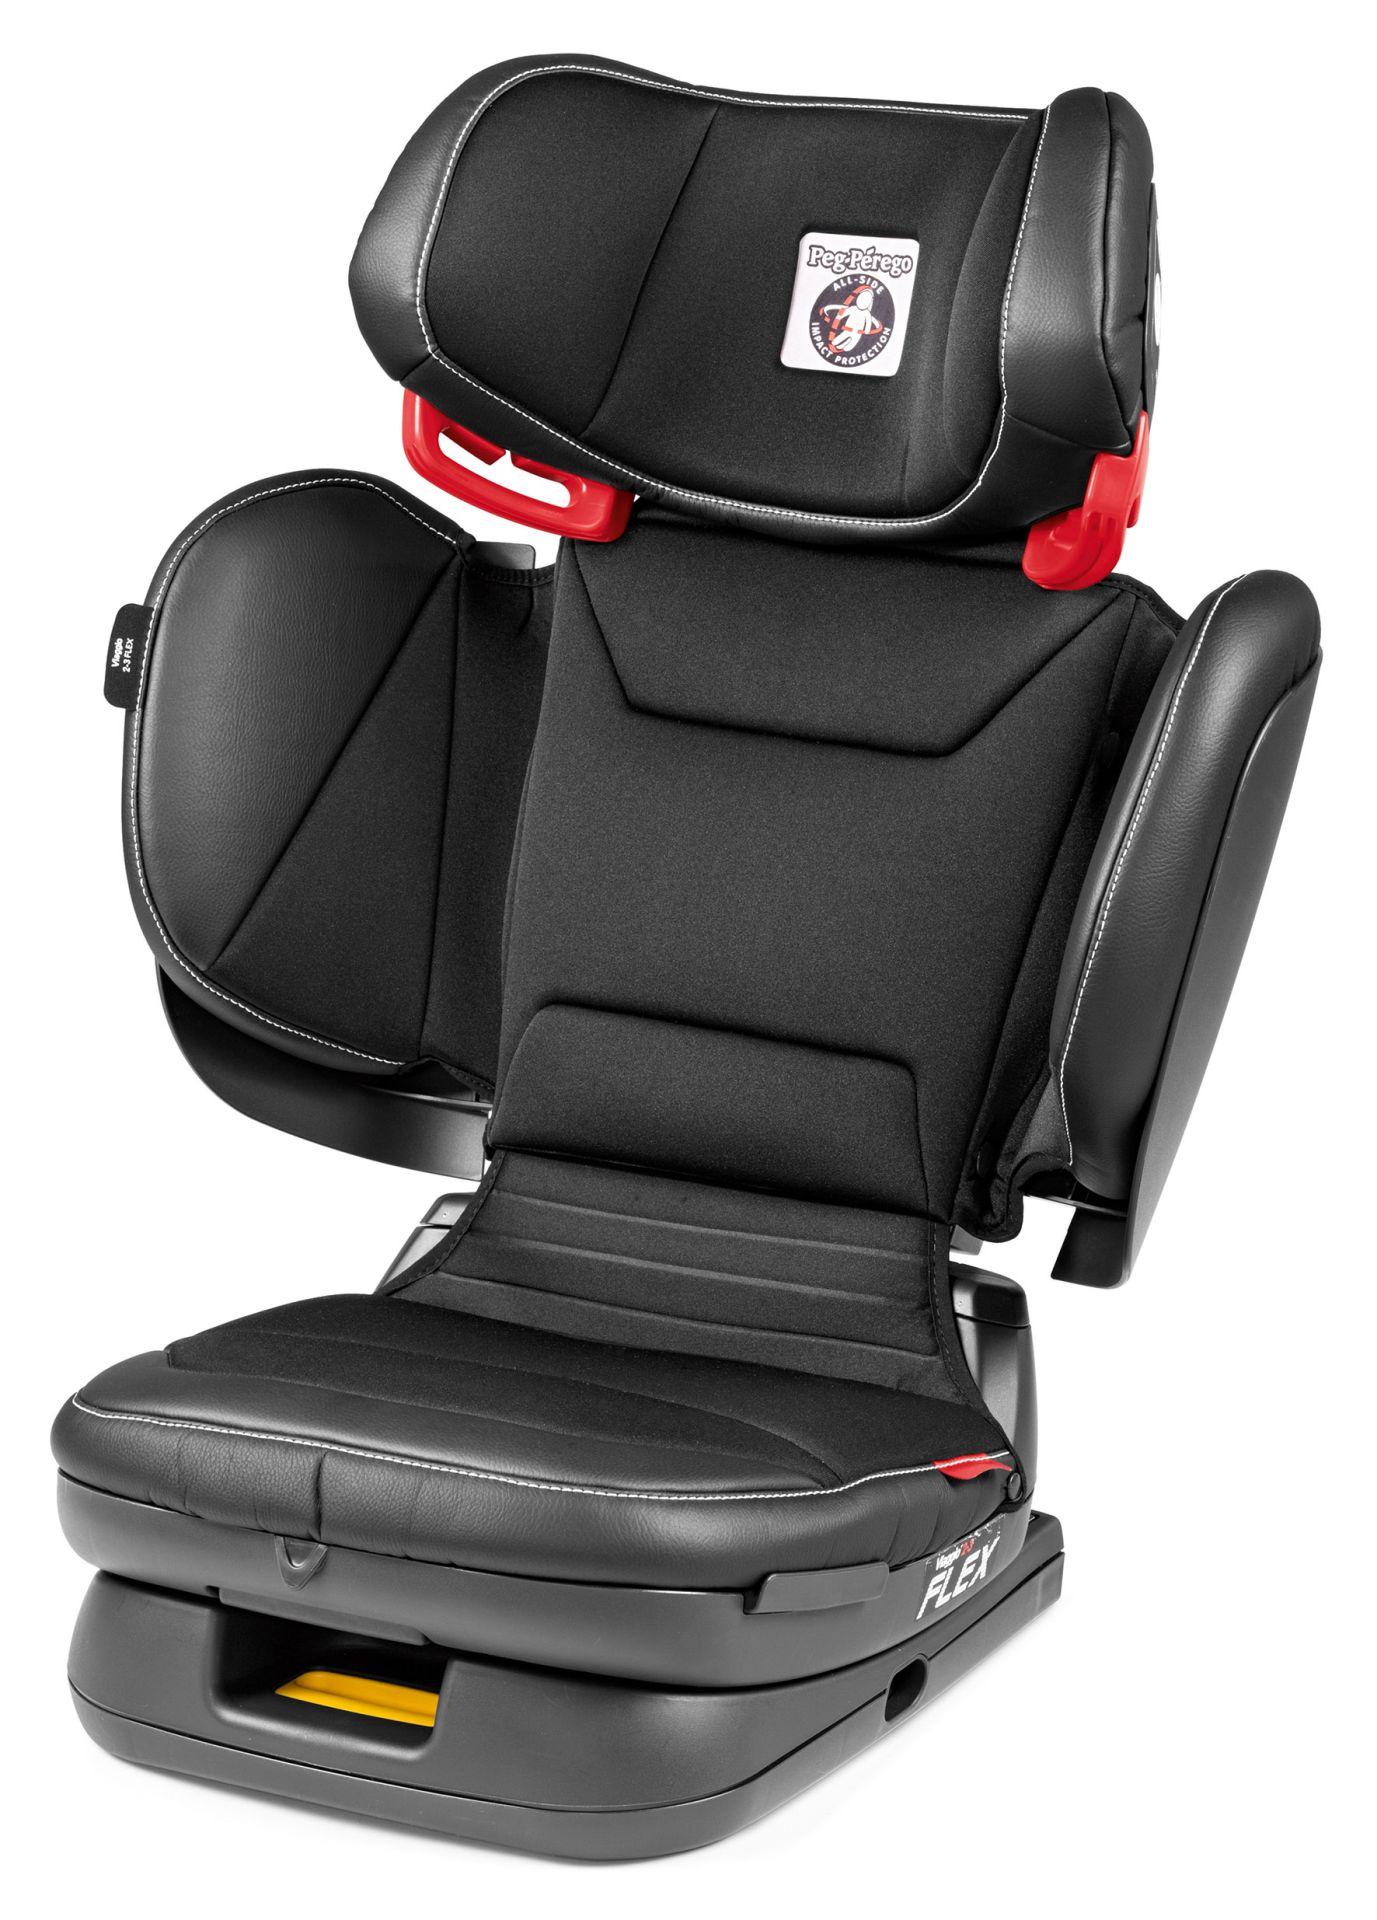 peg perego child car seat viaggio 2 3 flex 2018 licorice. Black Bedroom Furniture Sets. Home Design Ideas